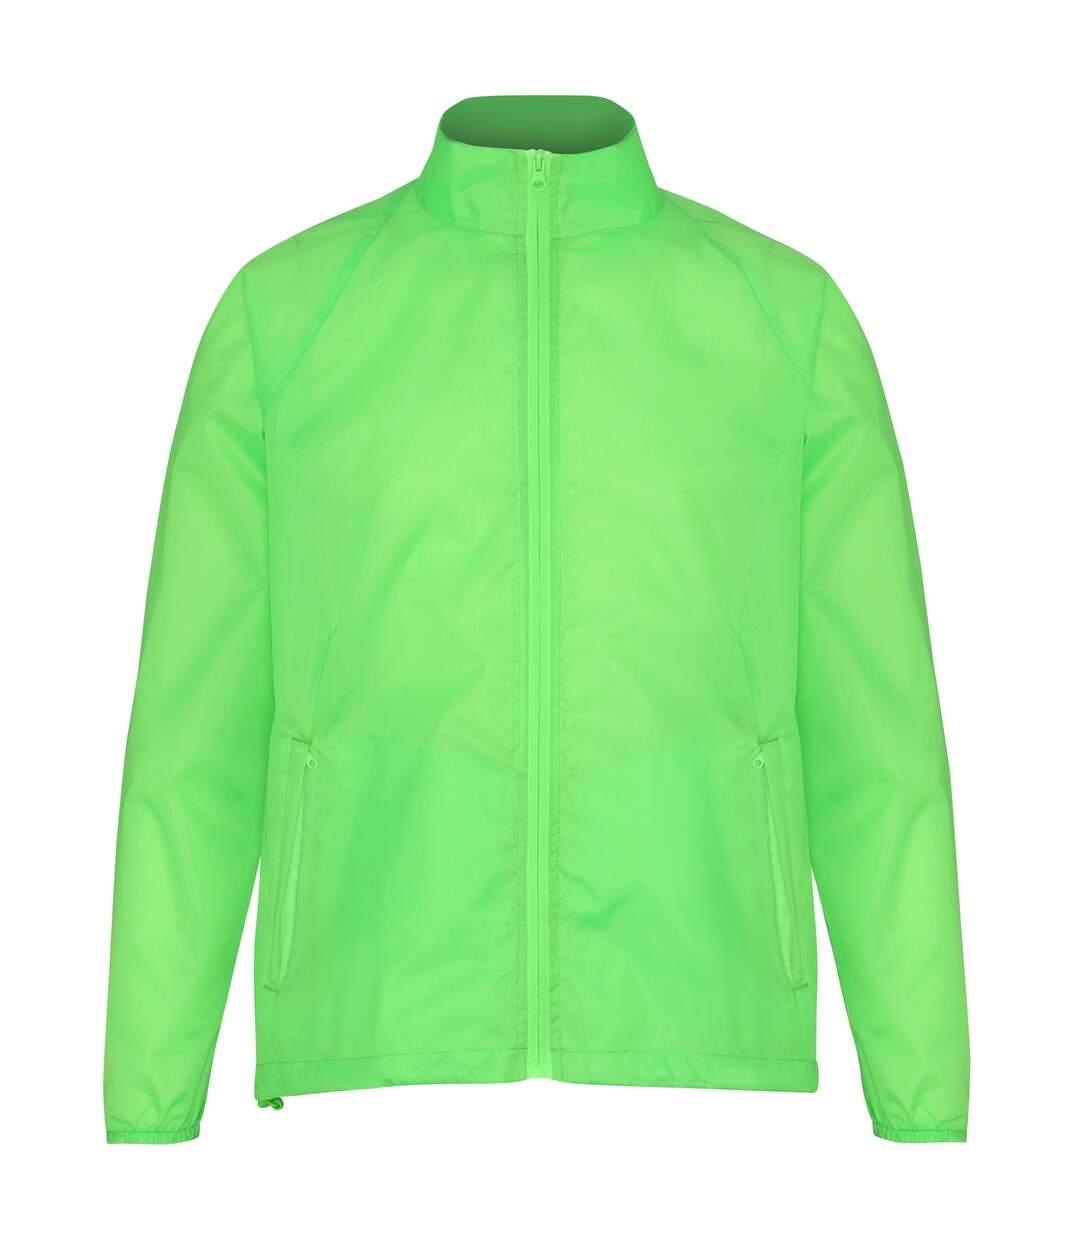 2786 Unisex Lightweight Plain Wind & Shower Resistant Jacket (Lime) - UTRW2500